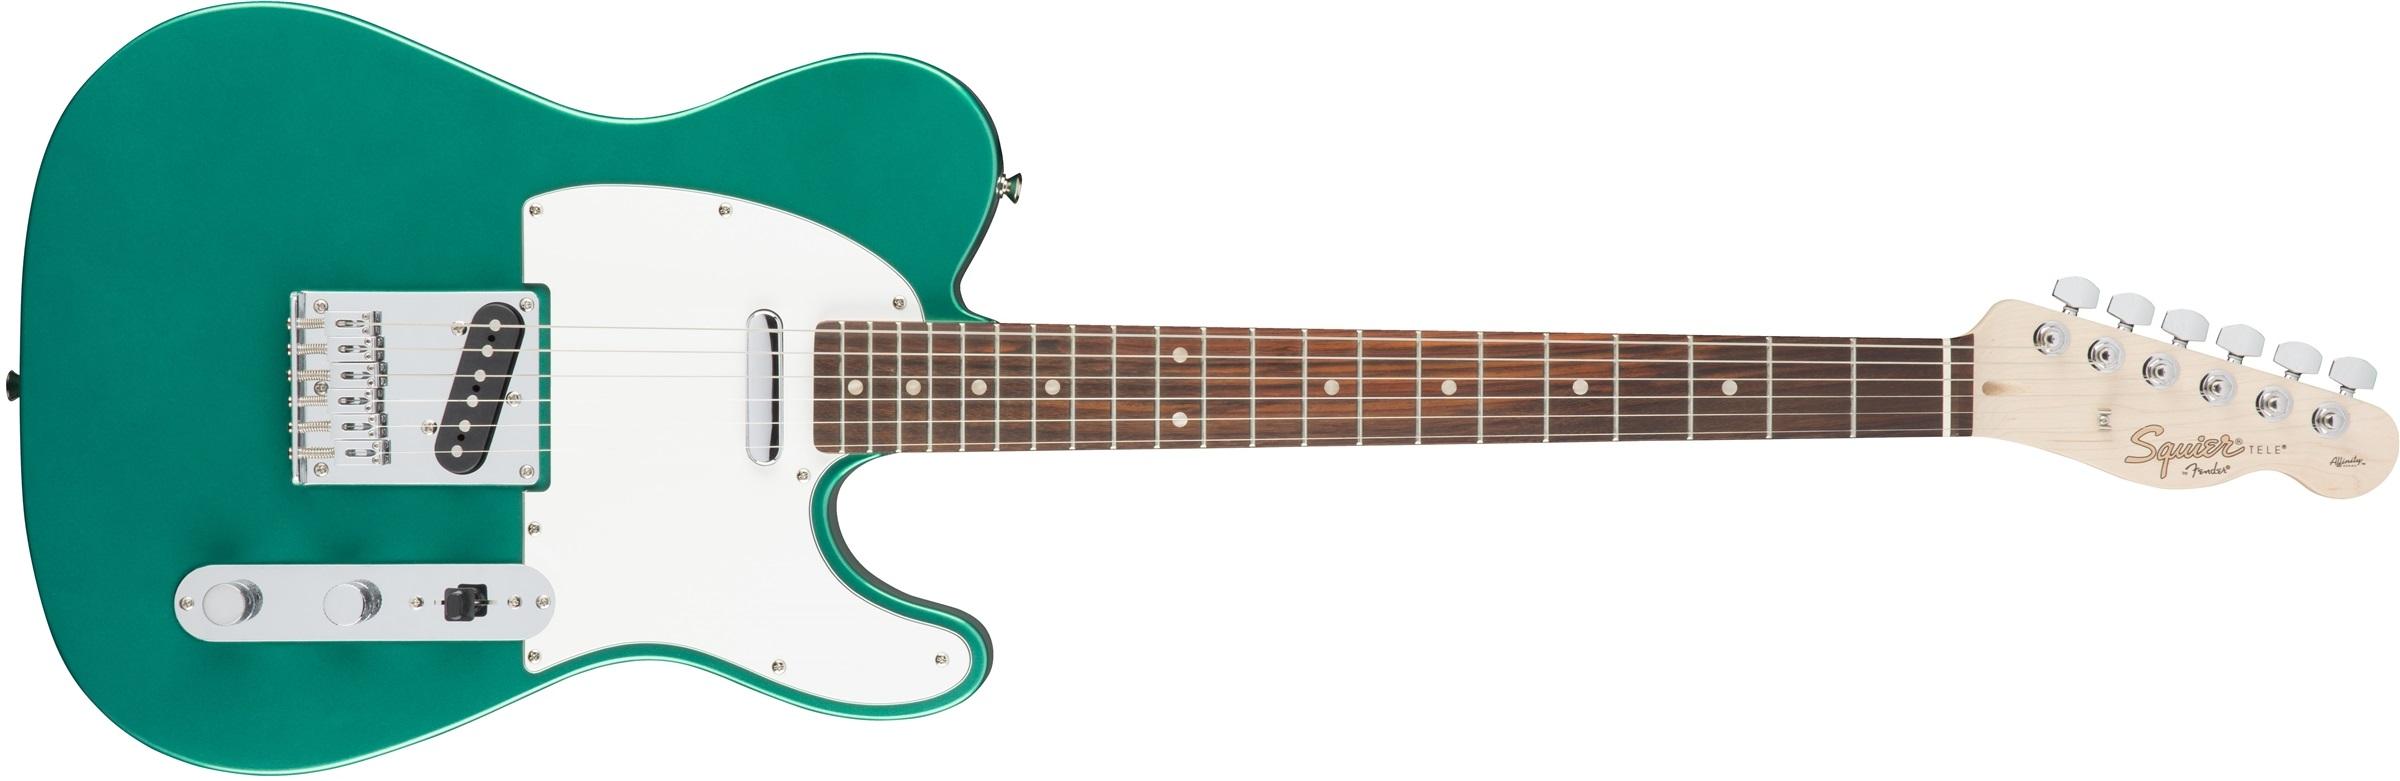 Fender Squier Affinity Telecaster LRL RCG